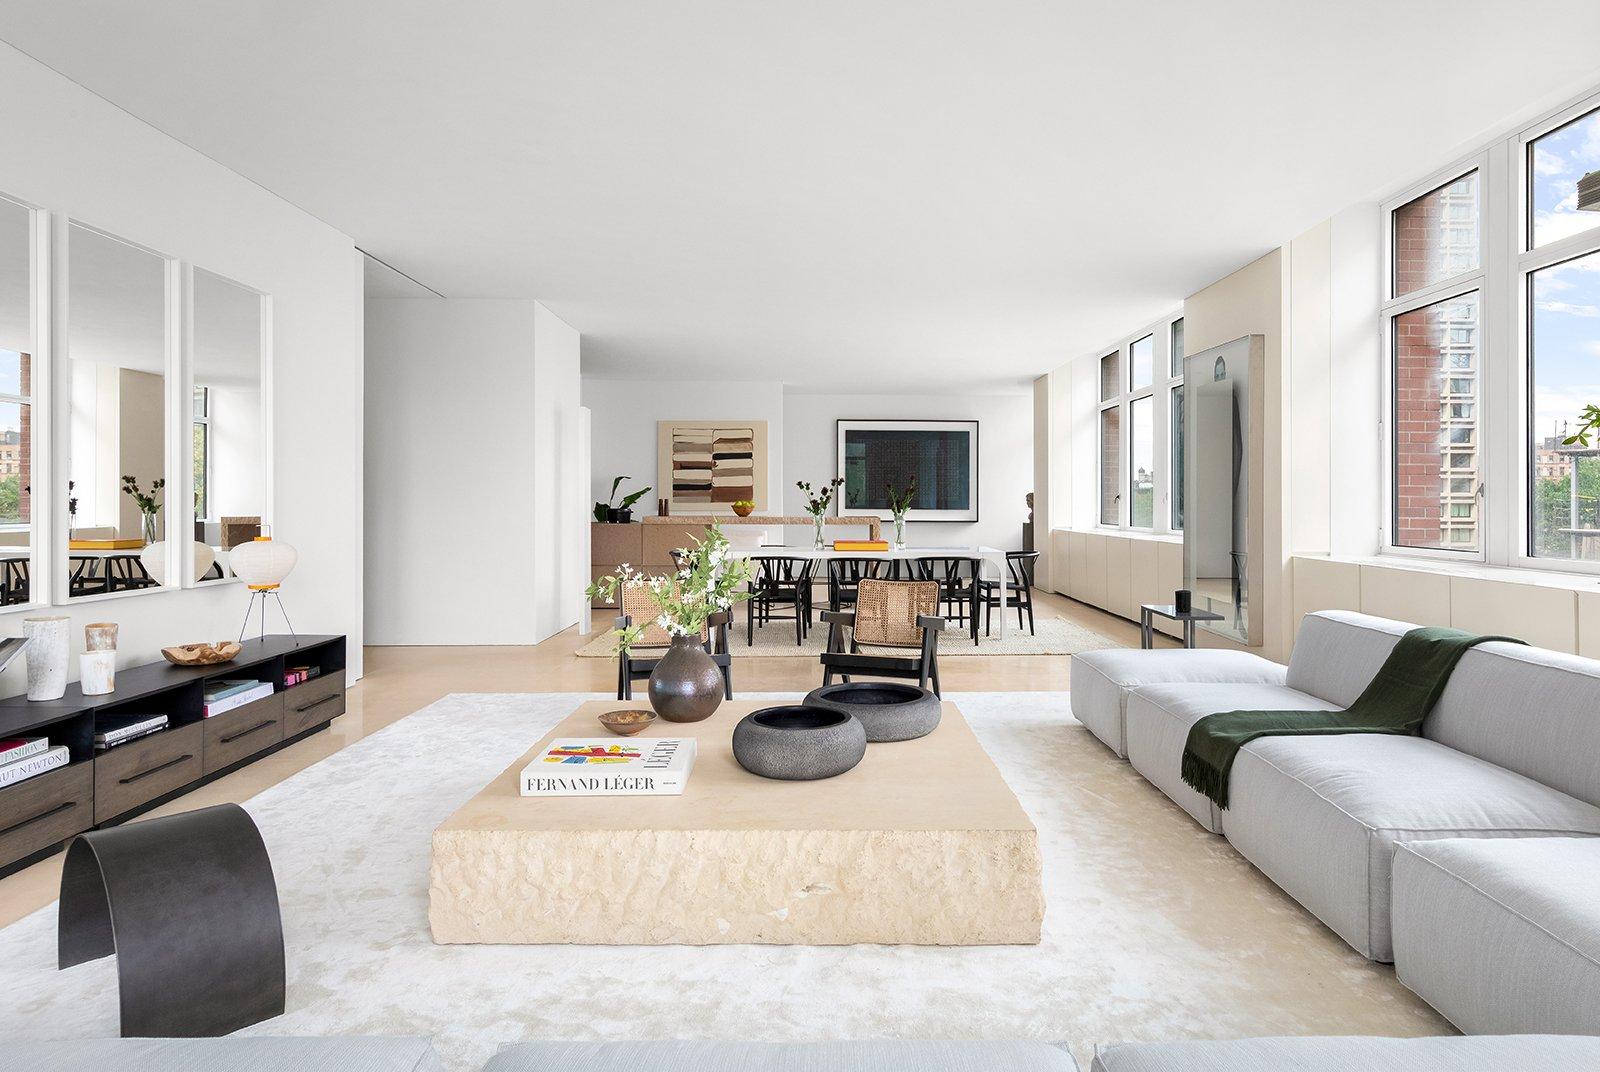 Kanye West and Kim Kardashian's SoHo Apartment living room